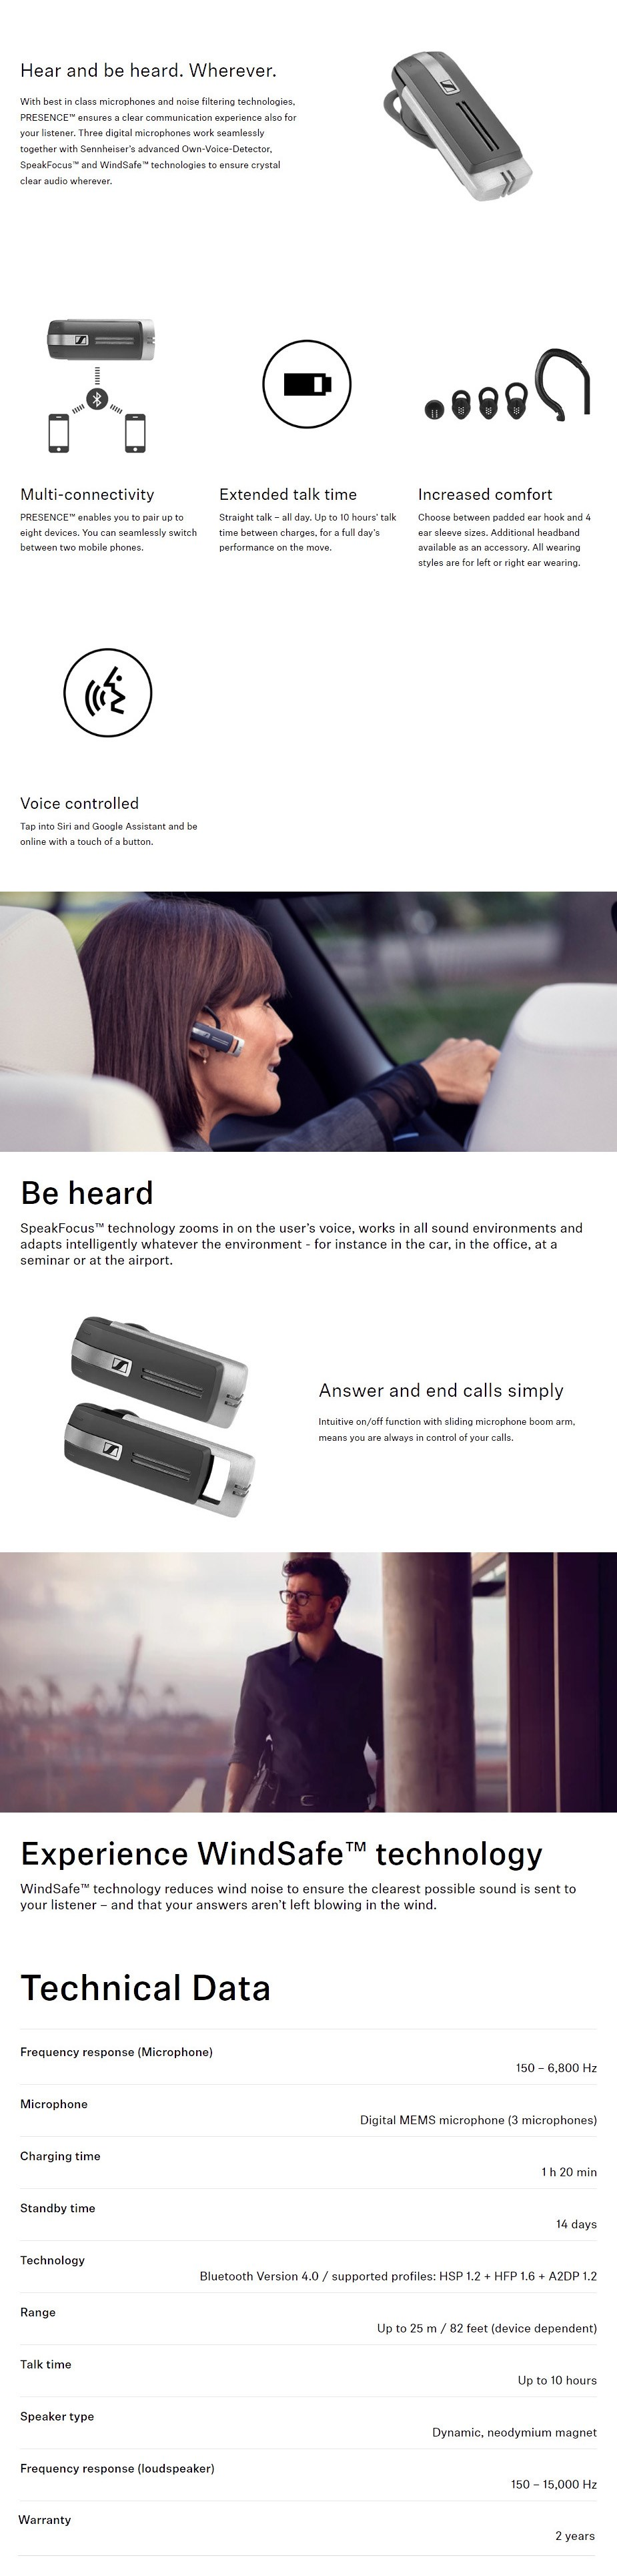 Sennheiser Presence Grey Business UC Certified Bluetooth Headset - Overview 1